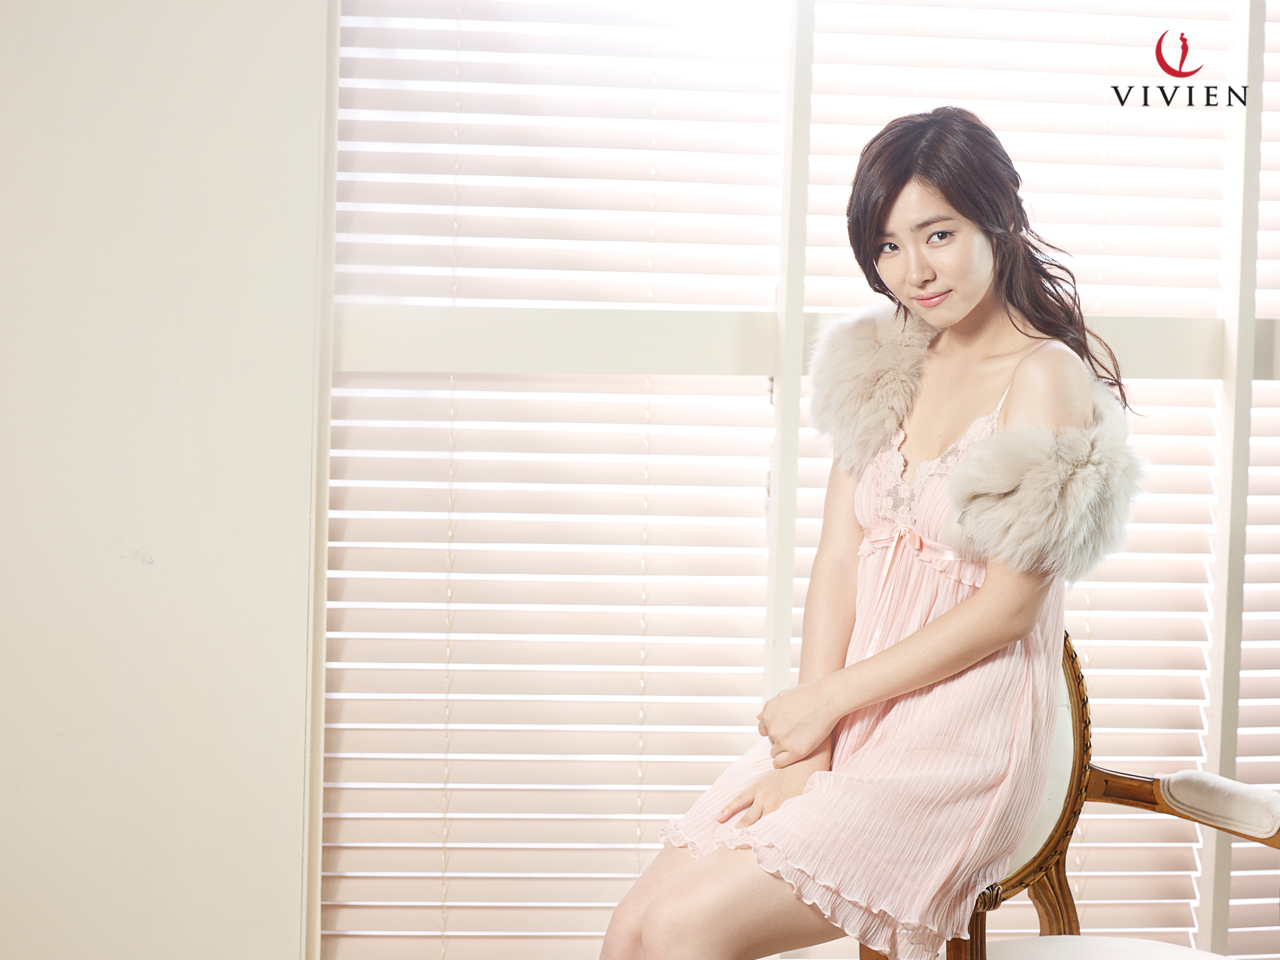 Vivien - Shin Se Kyung Wallpaper (32967443) - Fanpop fanclubs